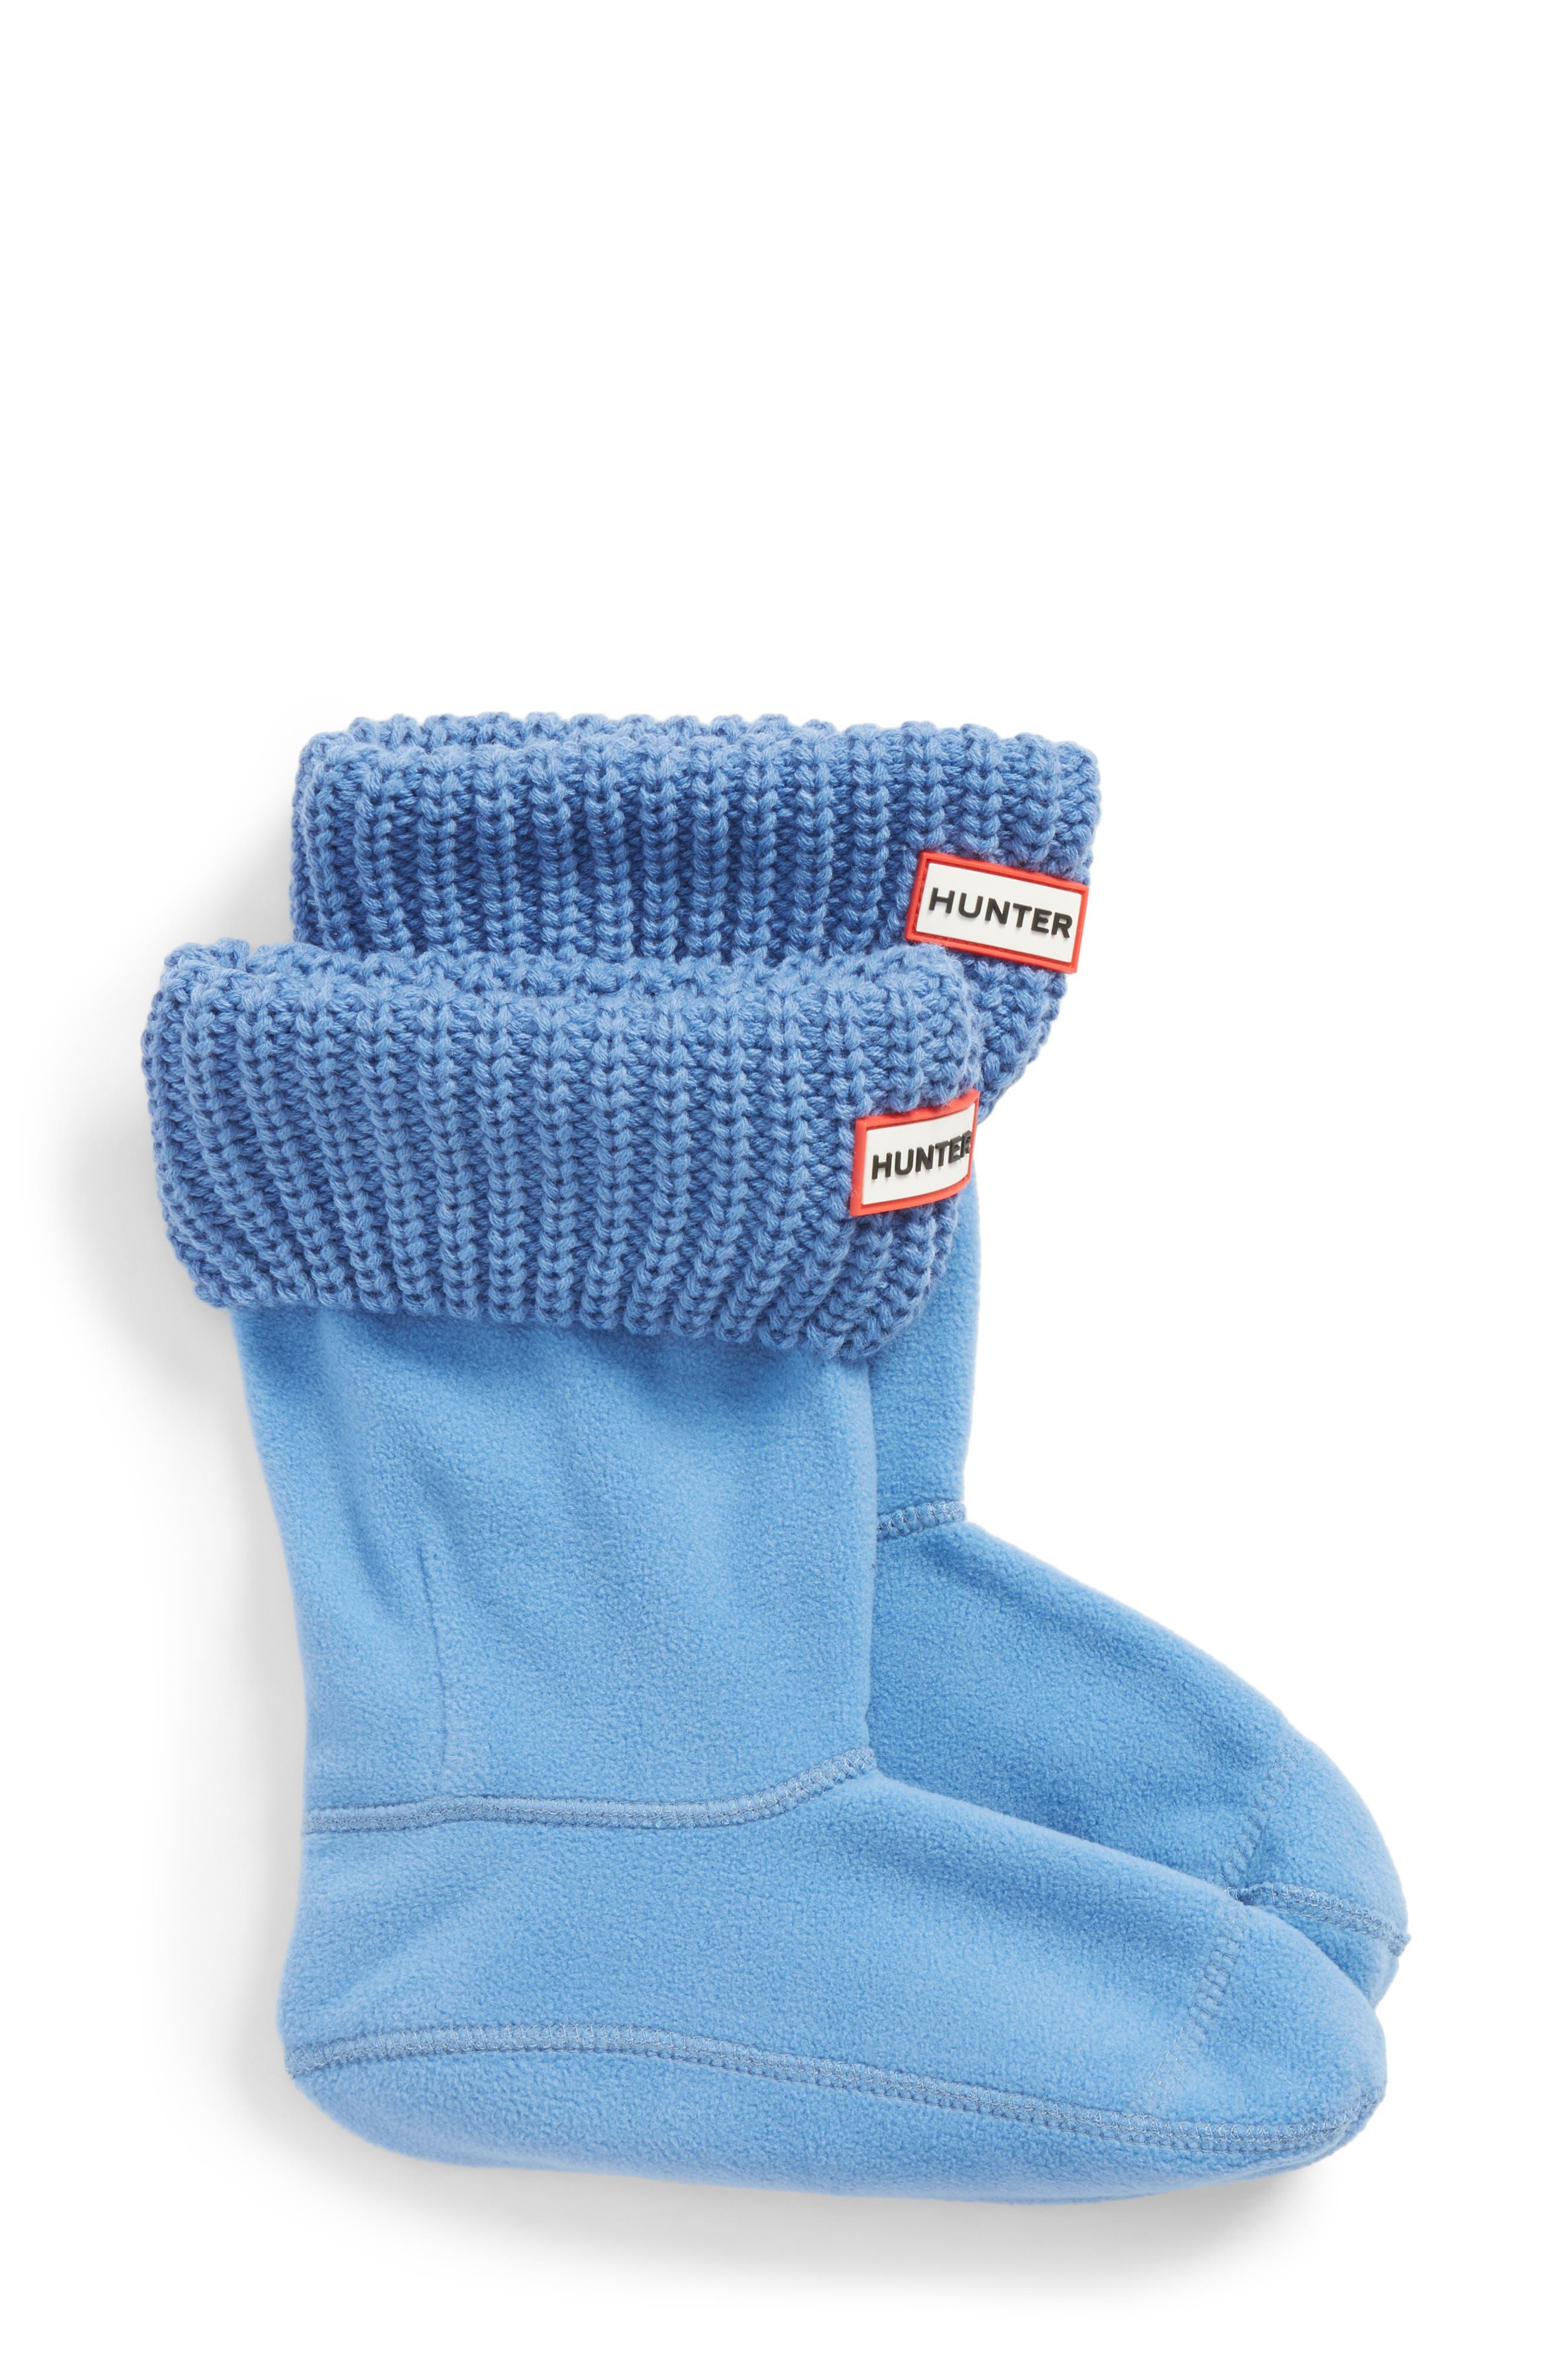 Main Image - Hunter 'Half Cardigan' Fleece Boot Socks (Women)